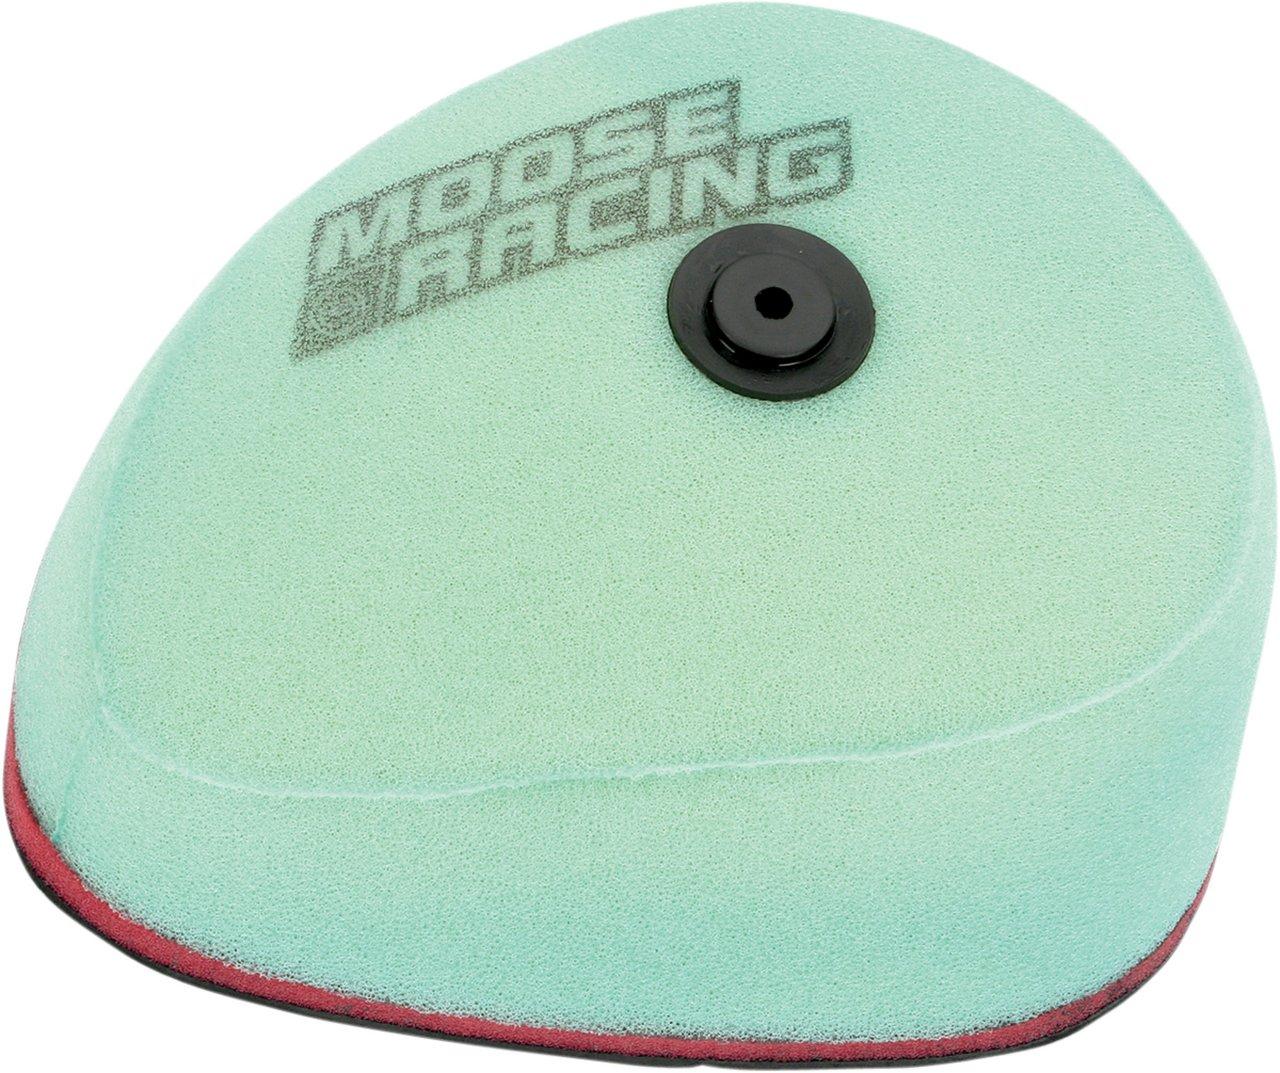 【MOOSE RACING】PRECISION PRE-OILED 空氣濾芯 [1011-0827] - 「Webike-摩托百貨」